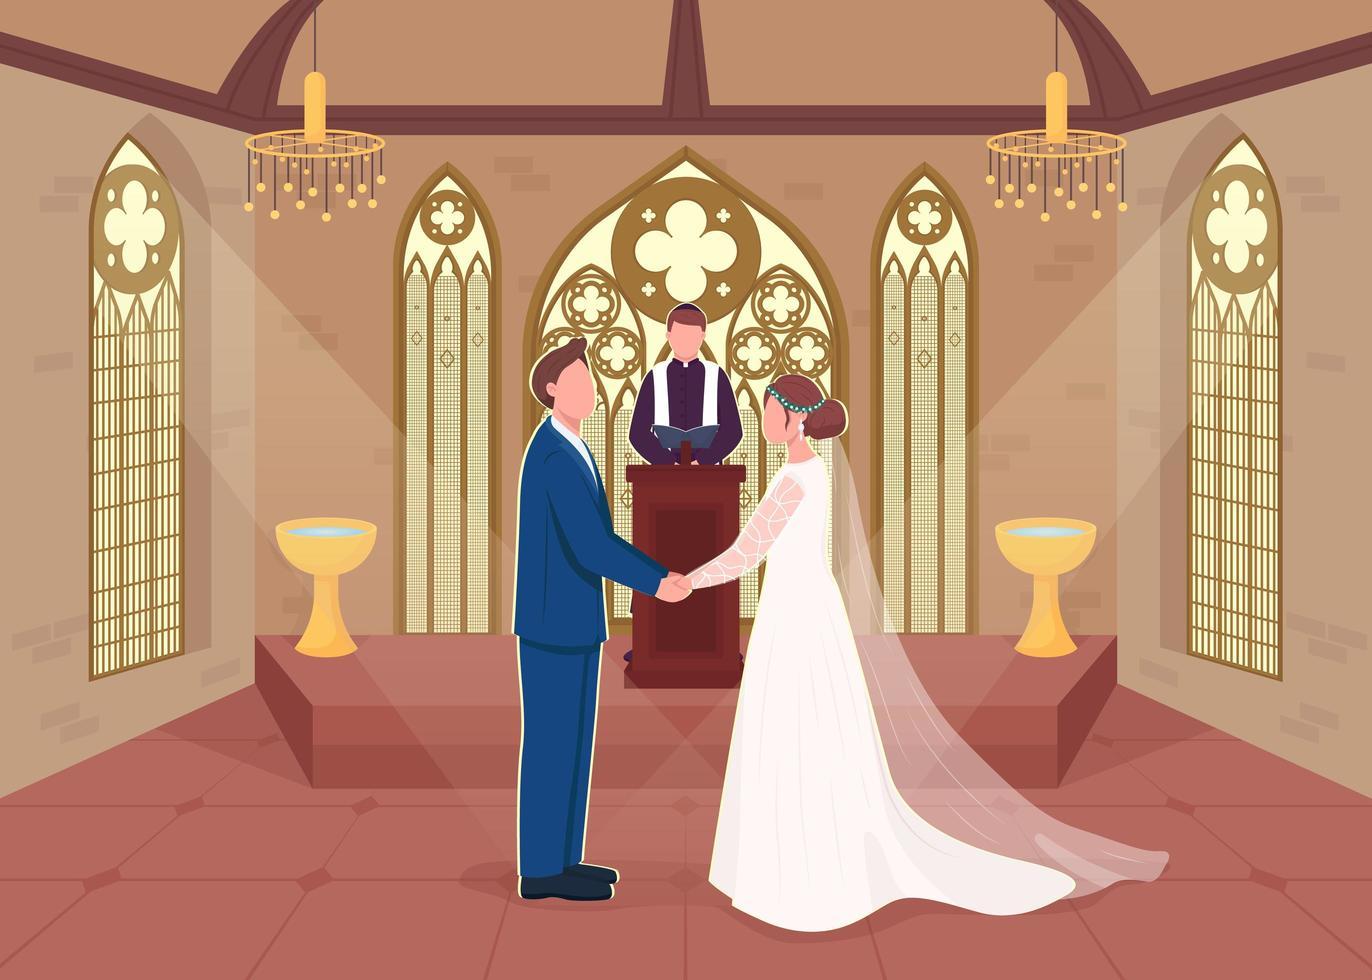 ceremonia de boda religiosa vector